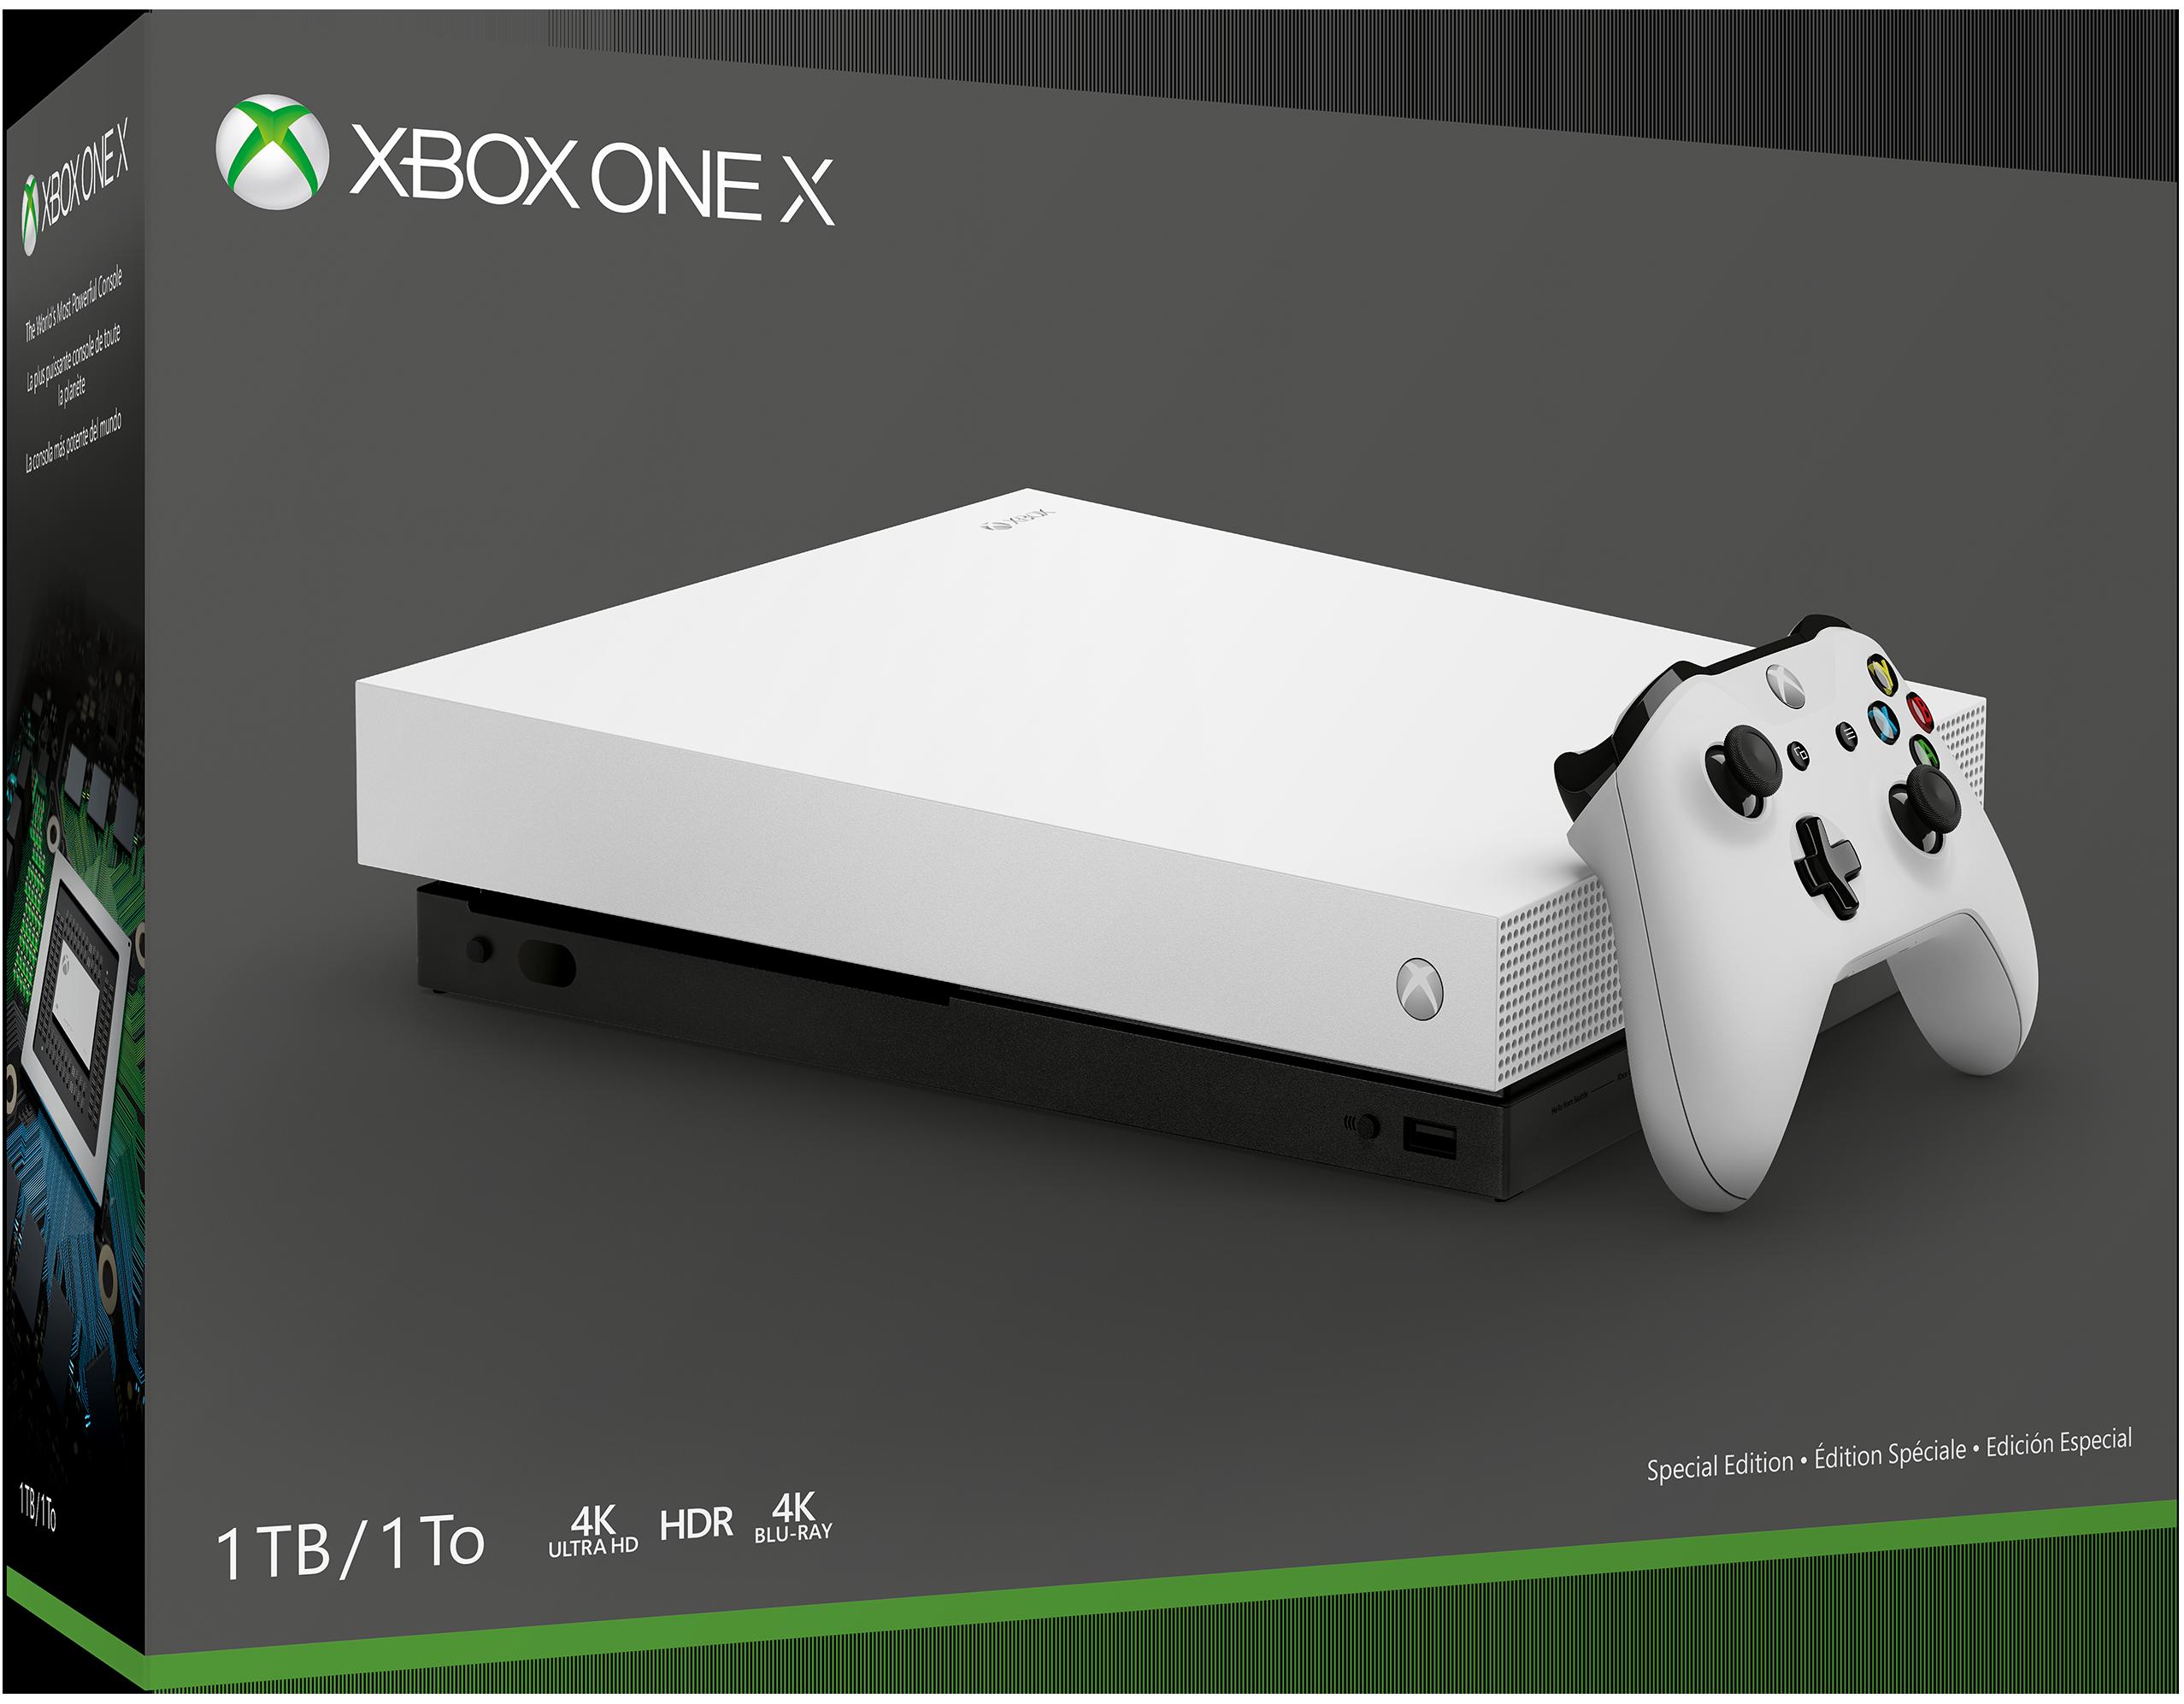 Xbox One X Robot White スペシャル エディション 1 TB 本体